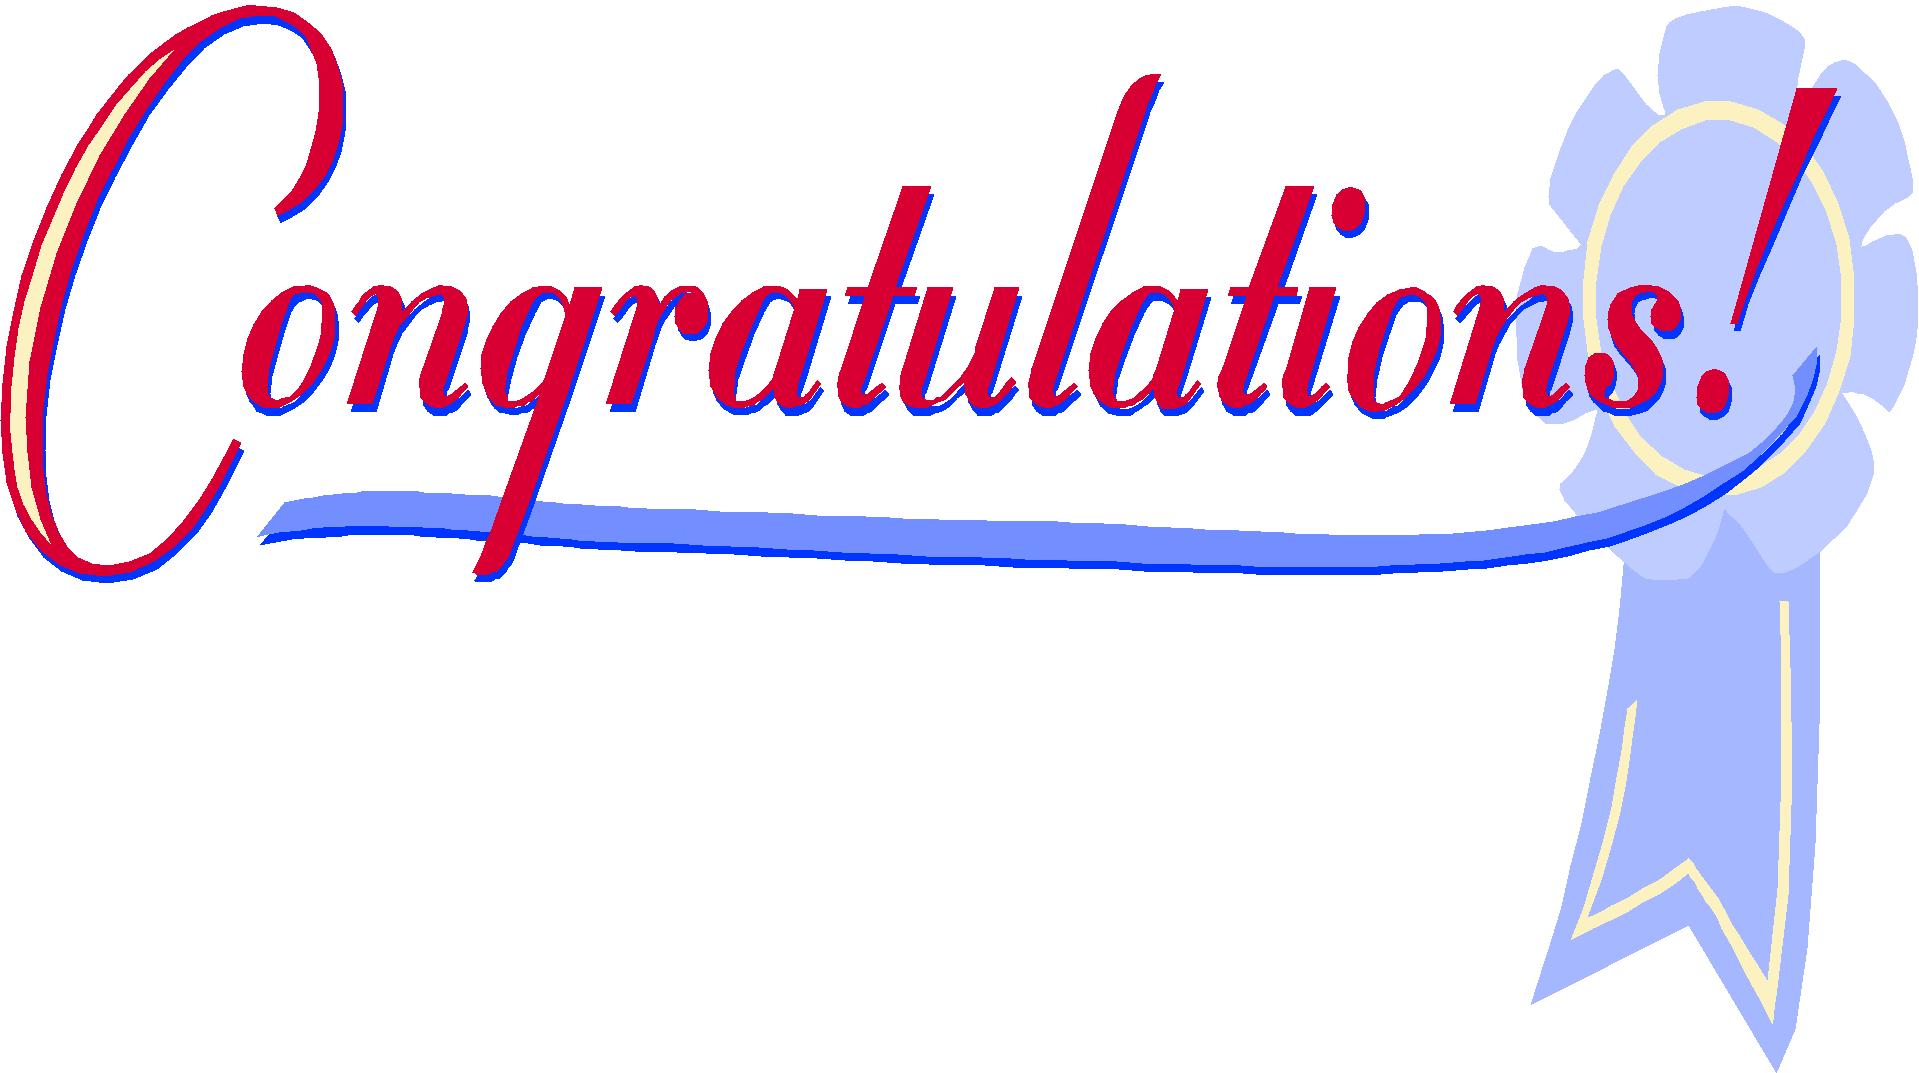 congratulations clipart 5 clipartion com 2 rh clipart info Congratulations Graphics Congratulations Graphics